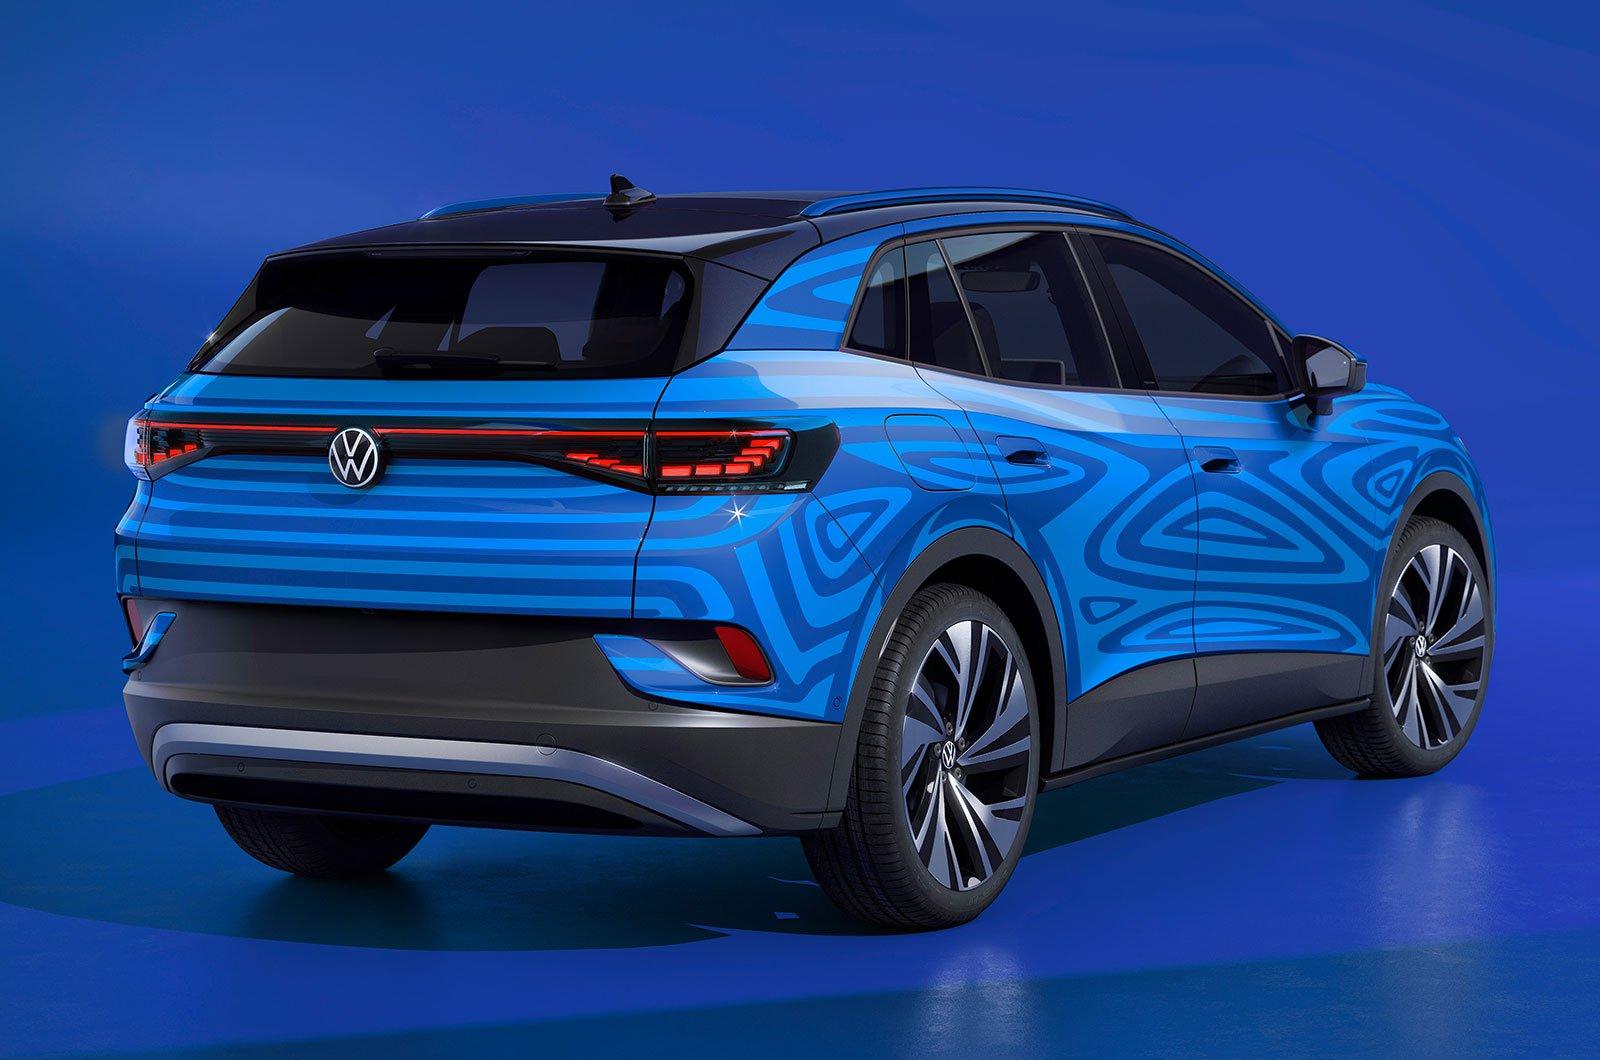 Volkswagen ID 4 rear